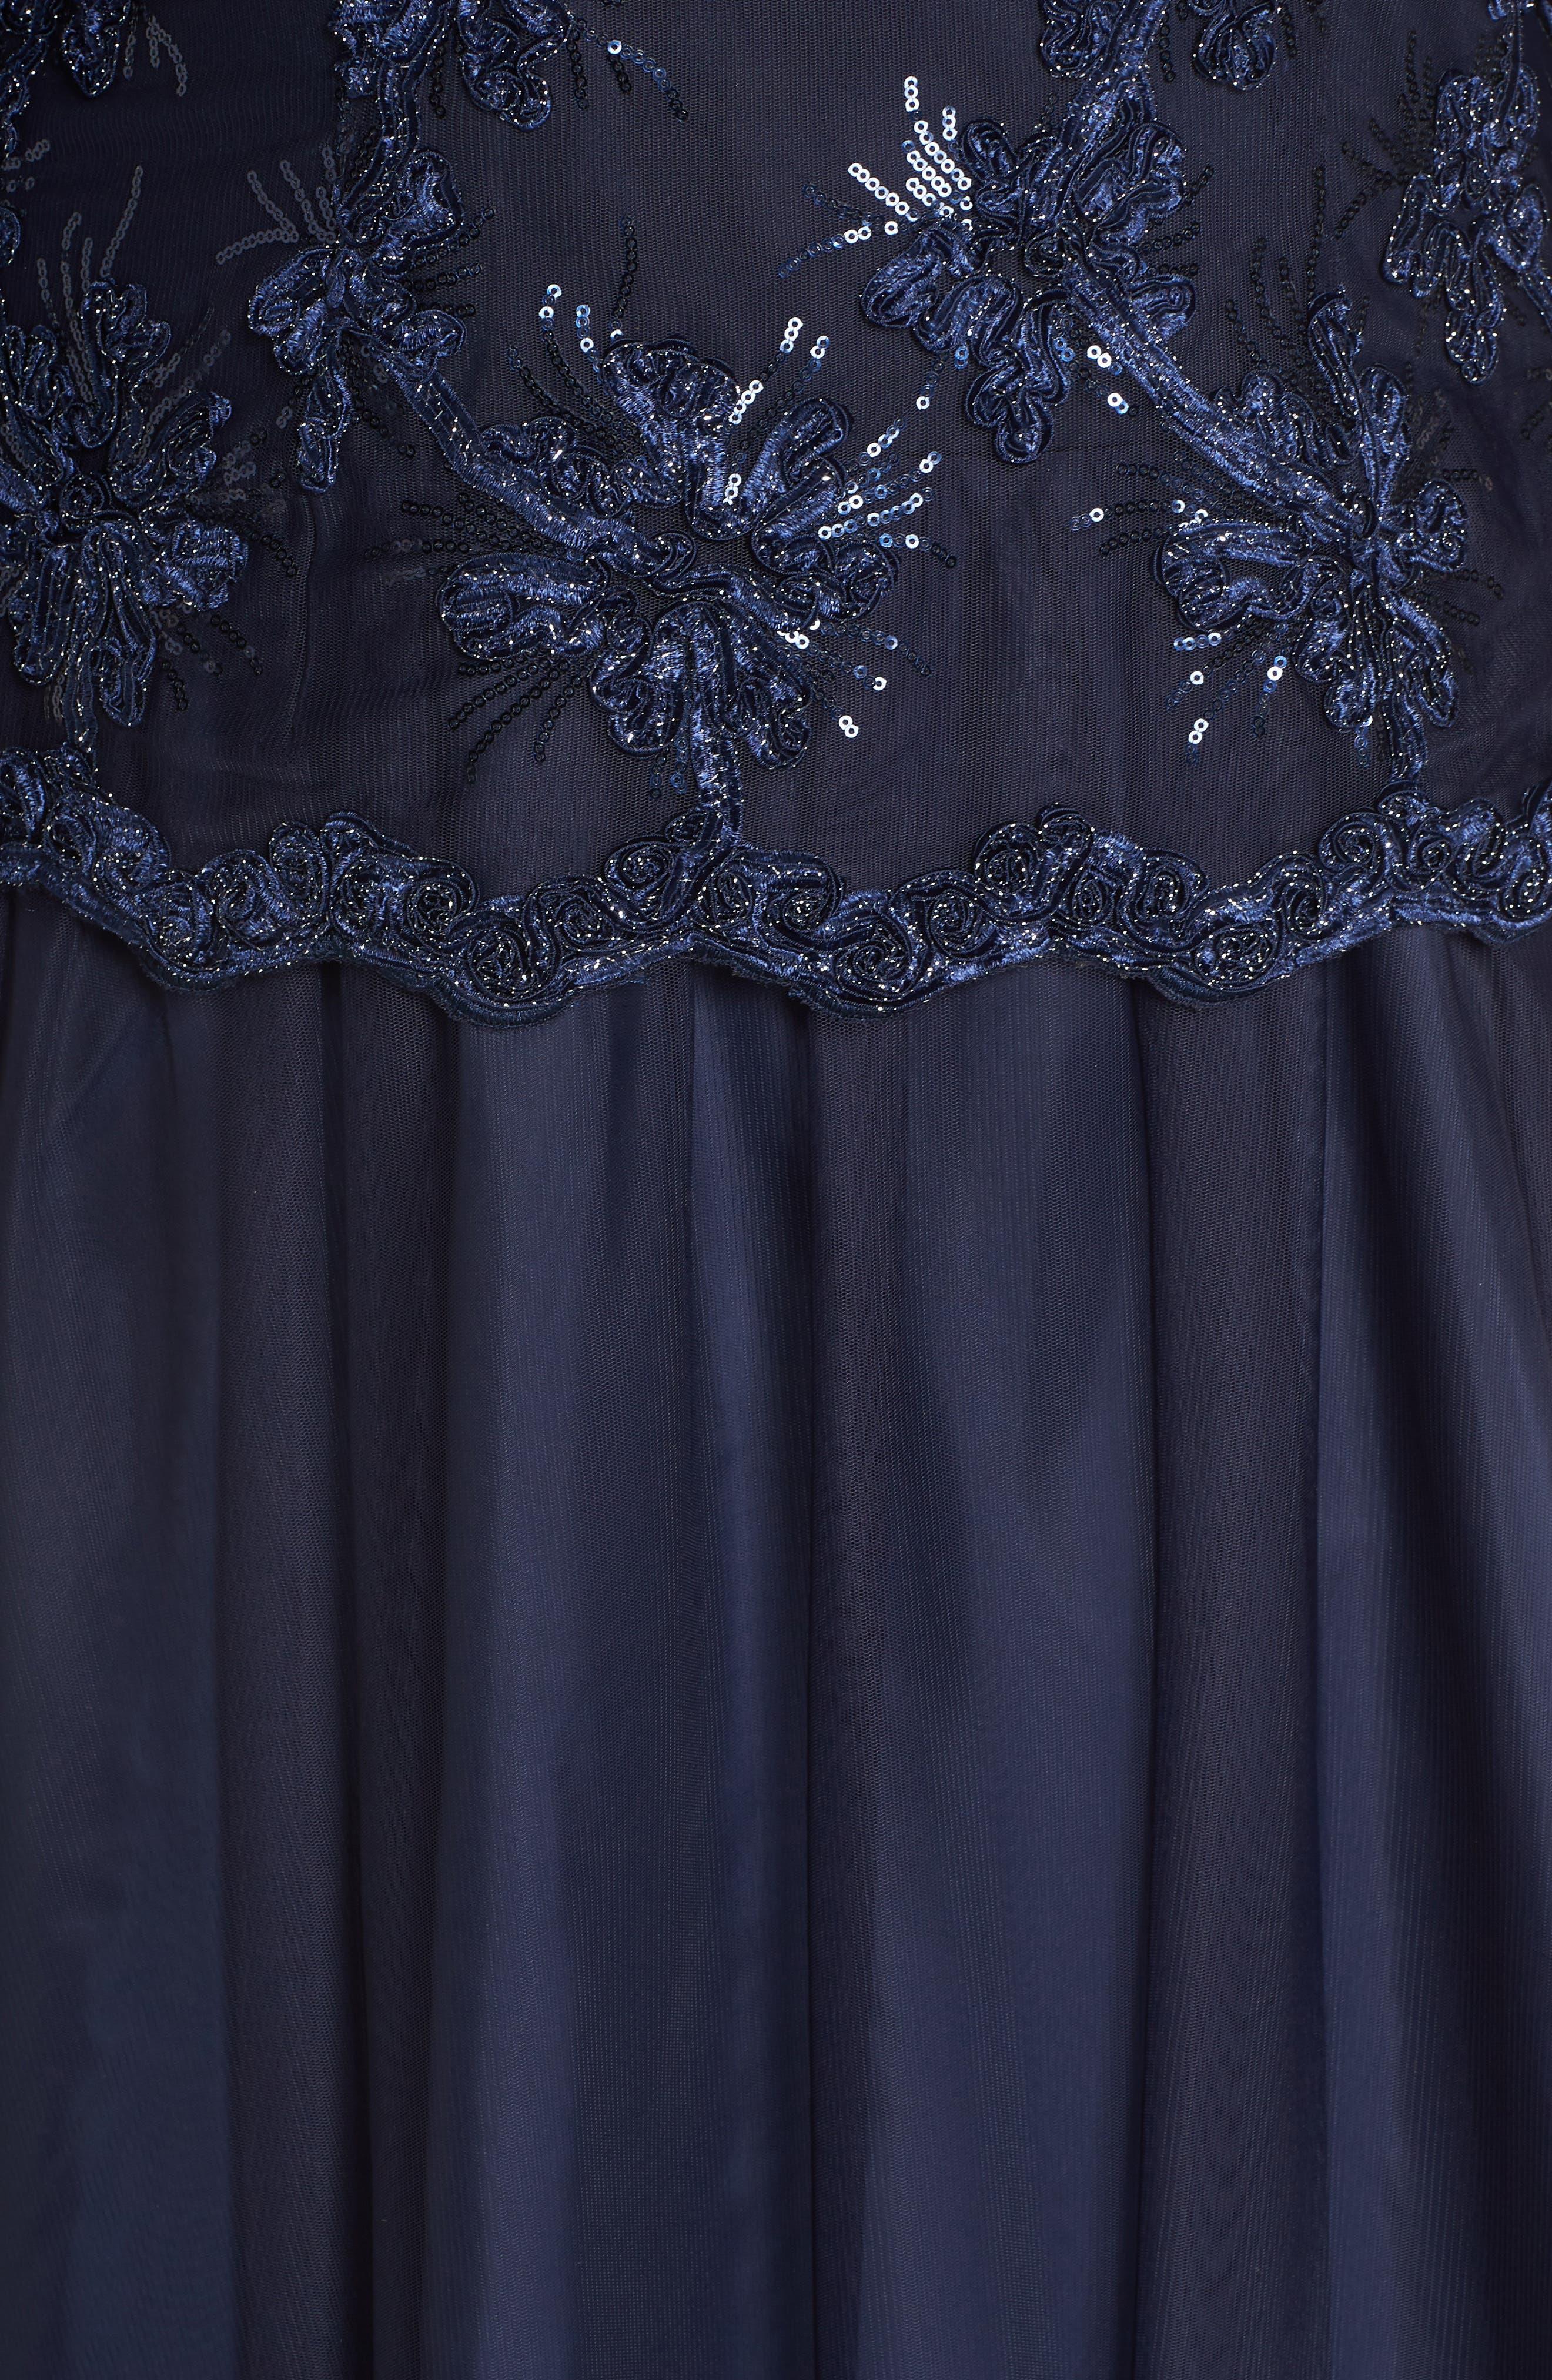 Embellished Bodice Tea Length Mesh Dress,                             Alternate thumbnail 5, color,                             410